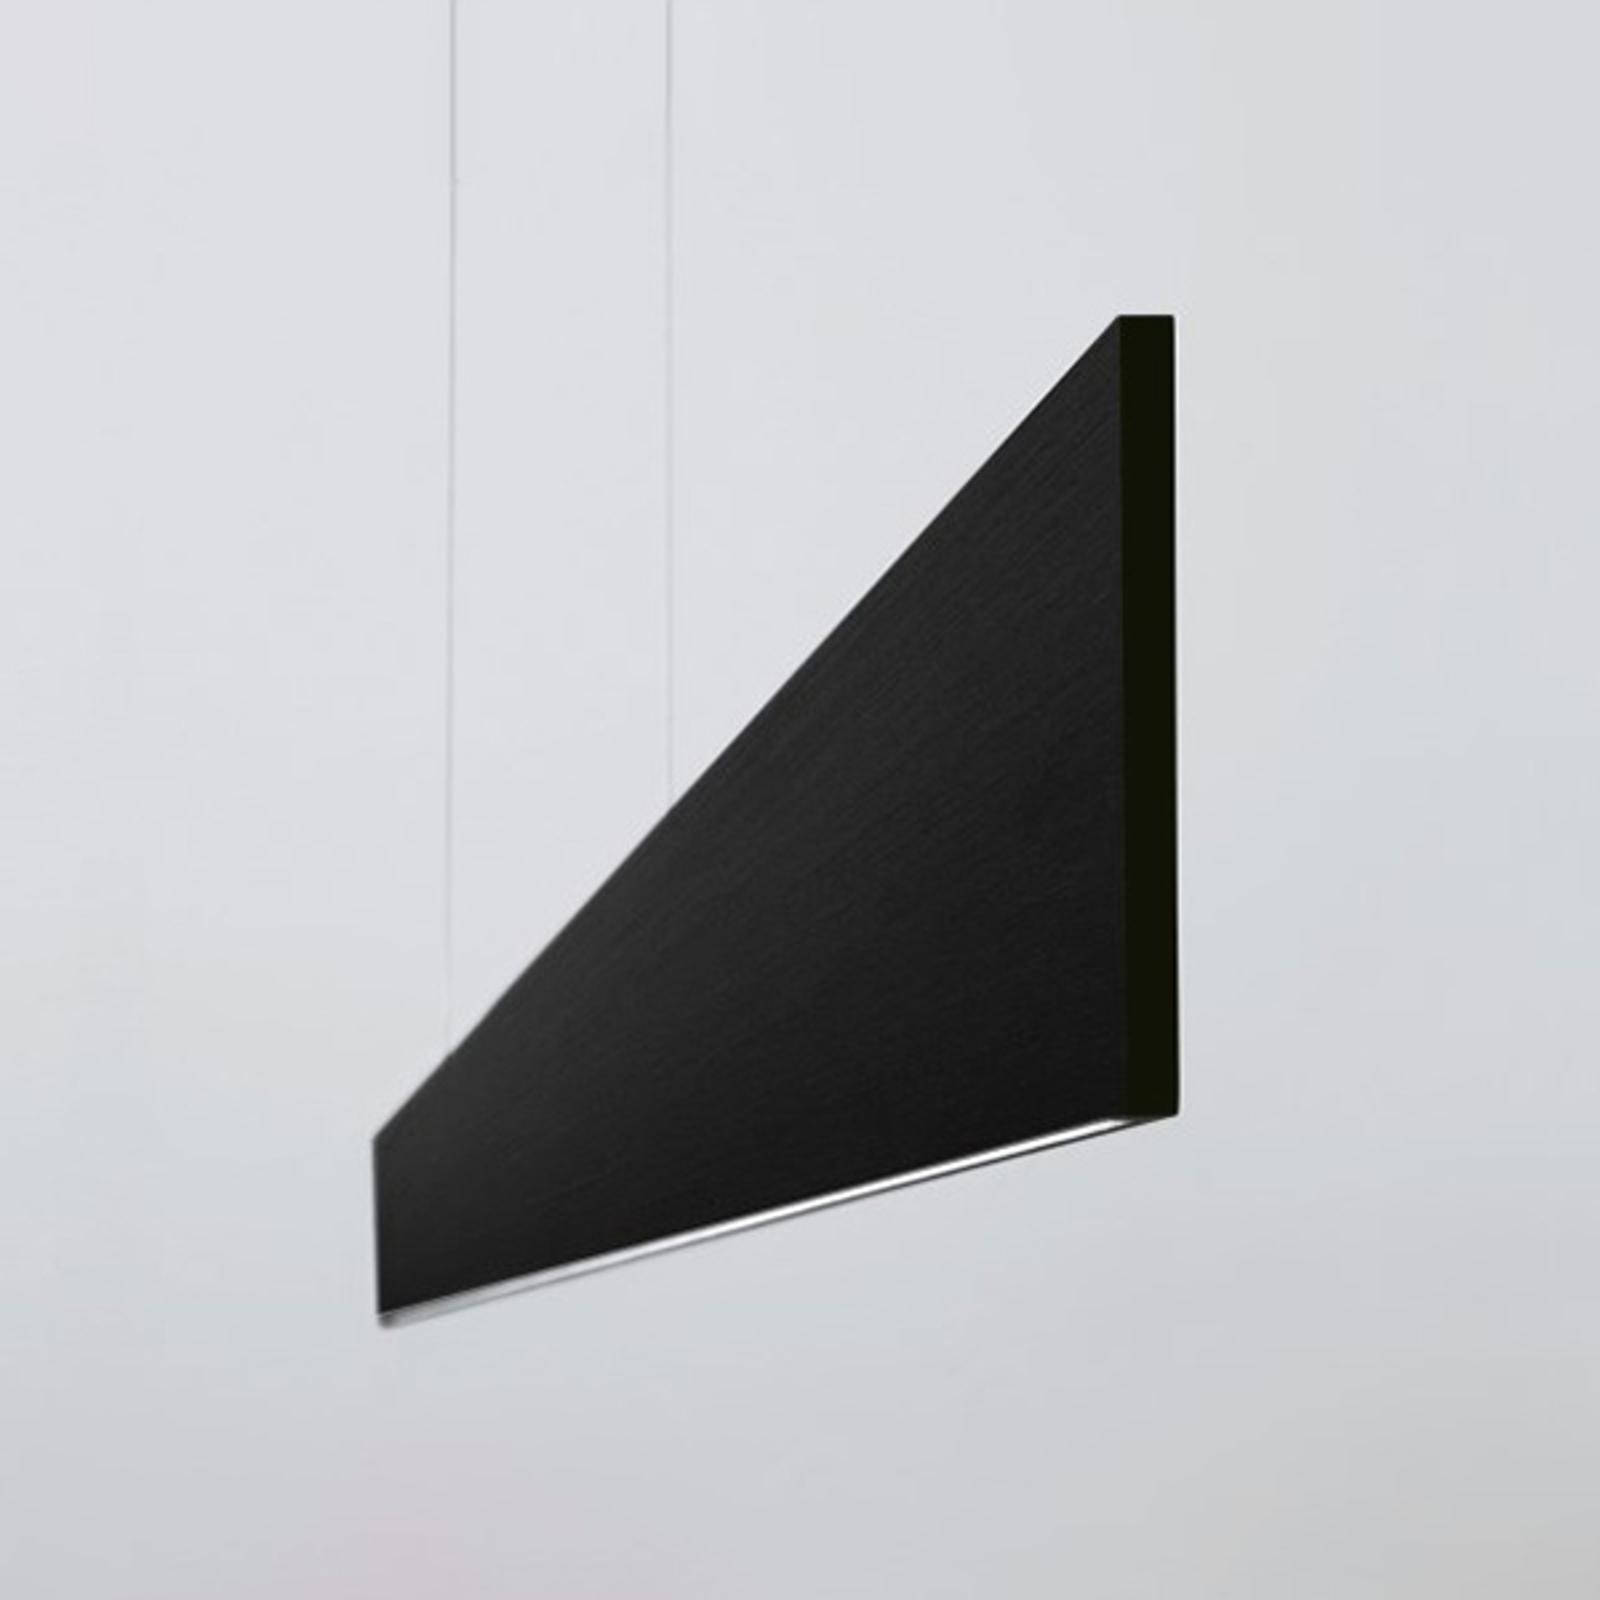 Lampa wisząca LED After 8 122cm DALI czarna